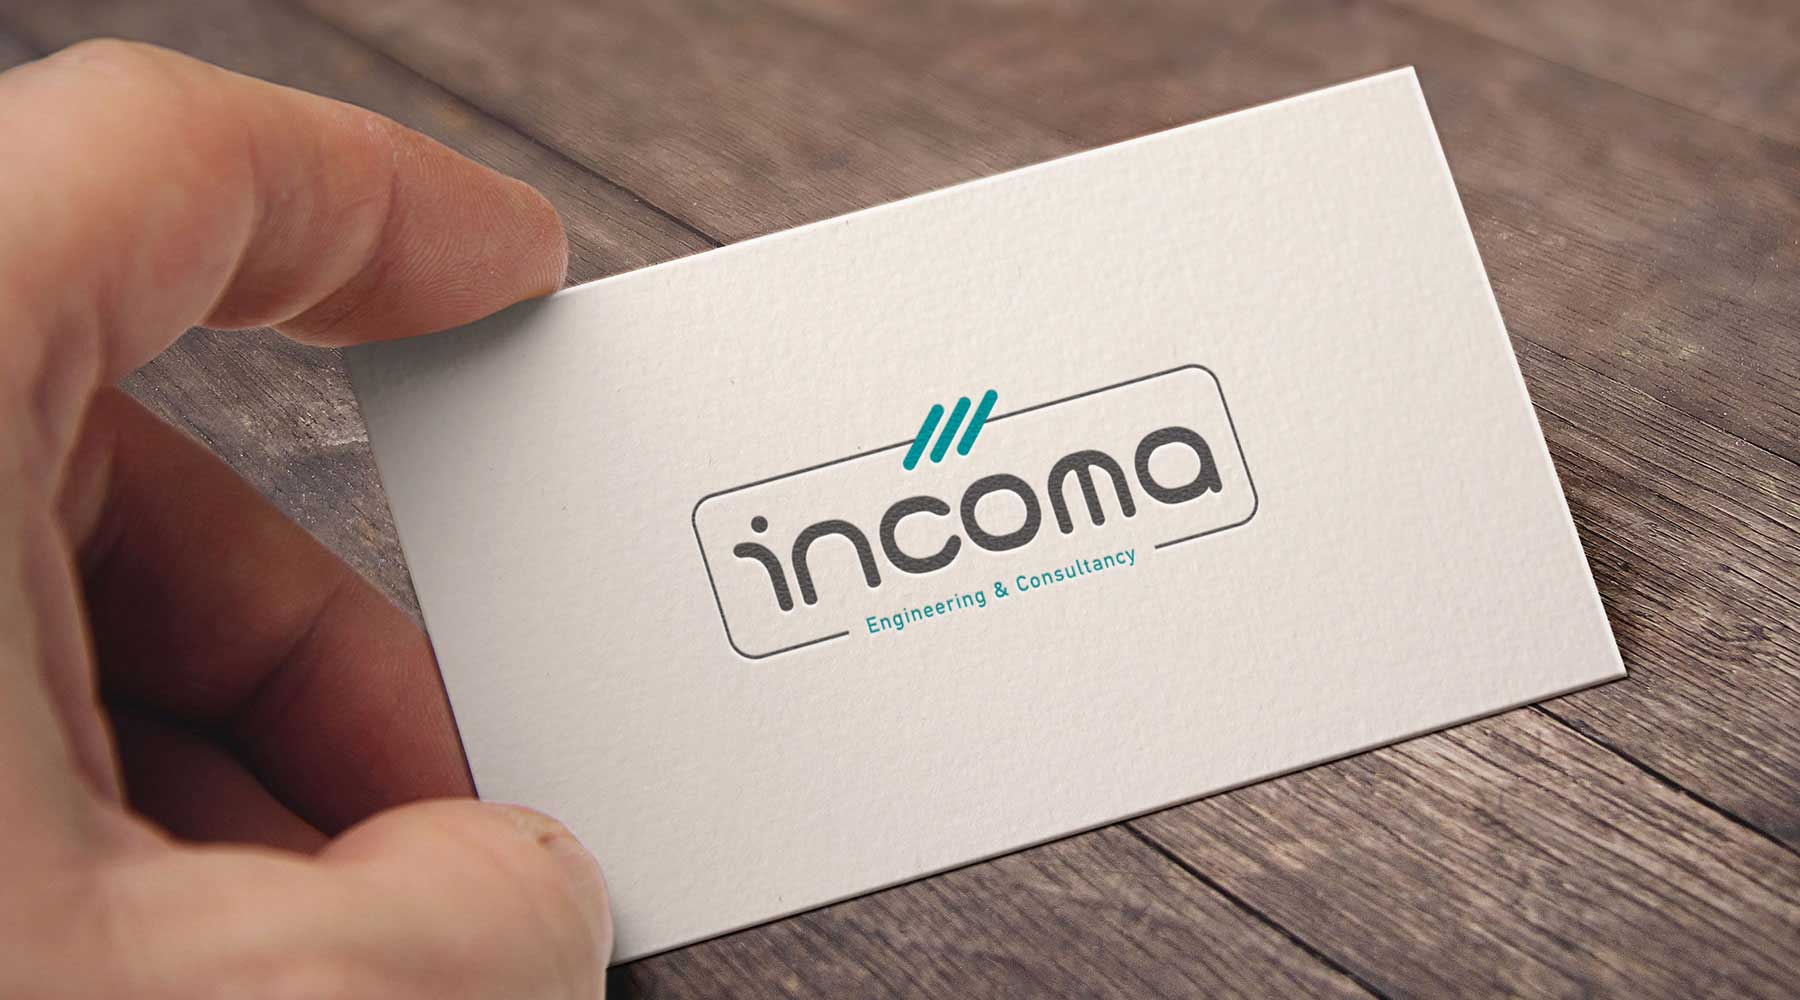 Incoma Engineering Consultancy logo tasarımı eskişehir